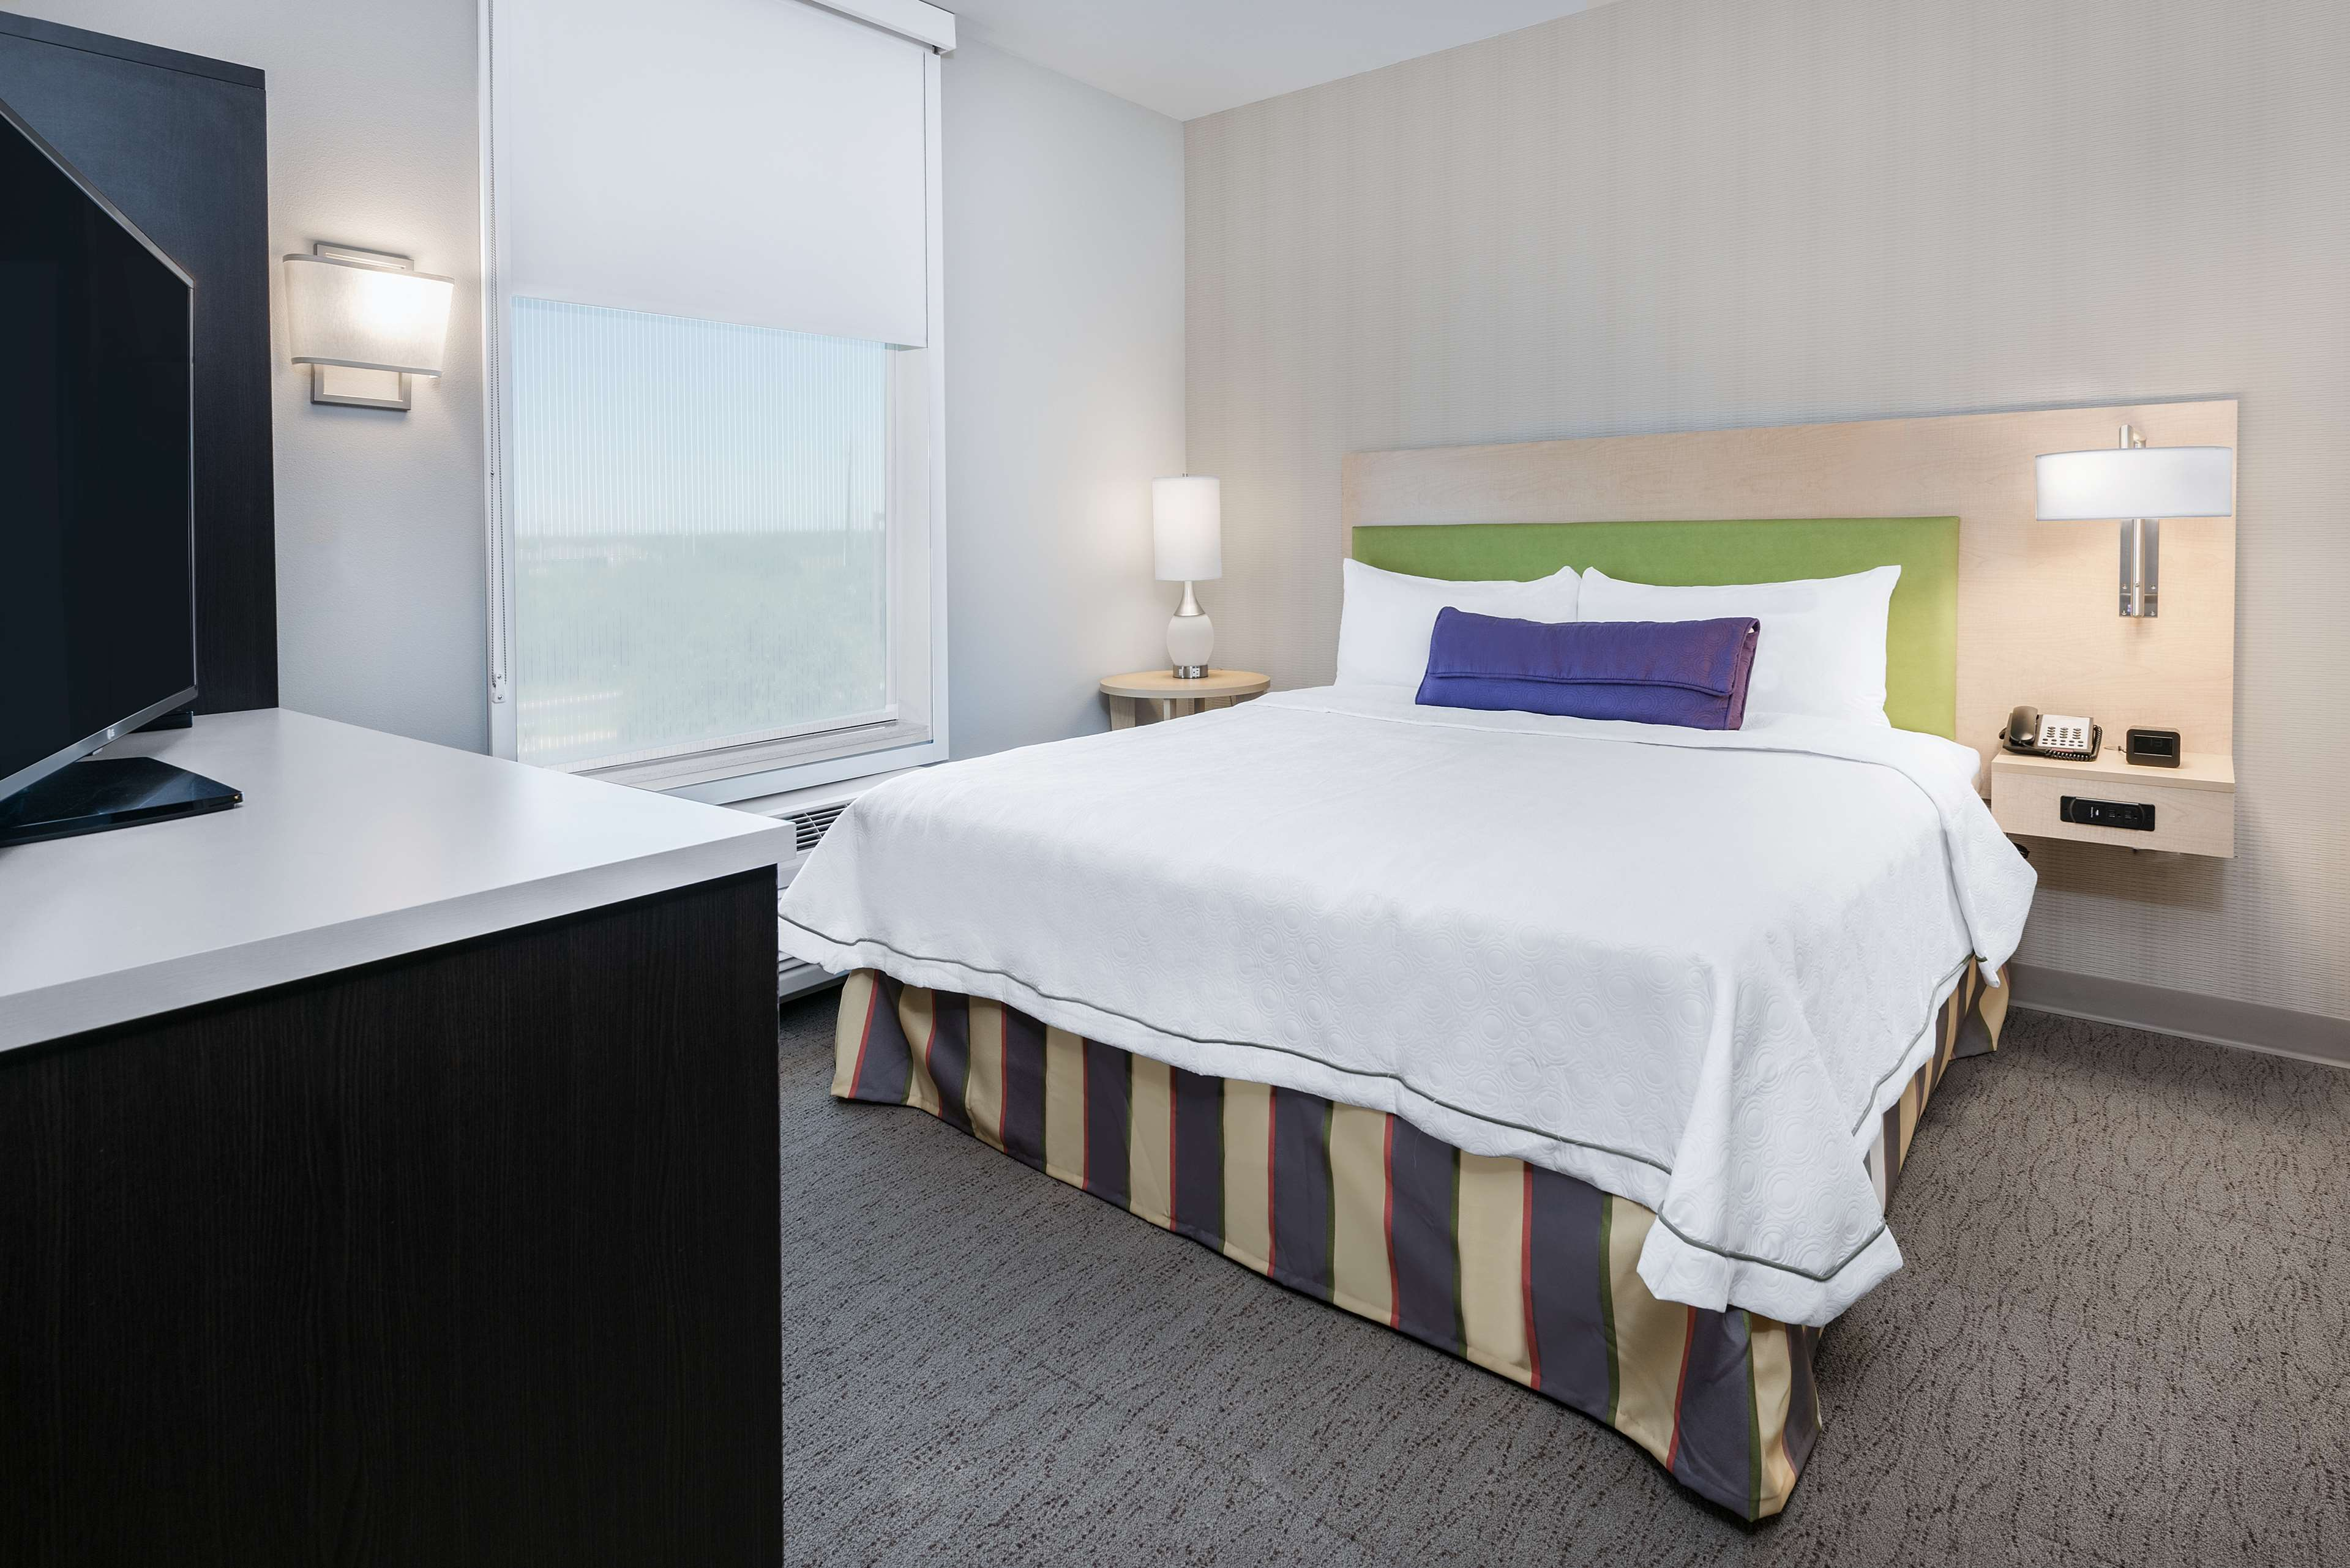 Home2 Suites by Hilton Austin Airport image 31